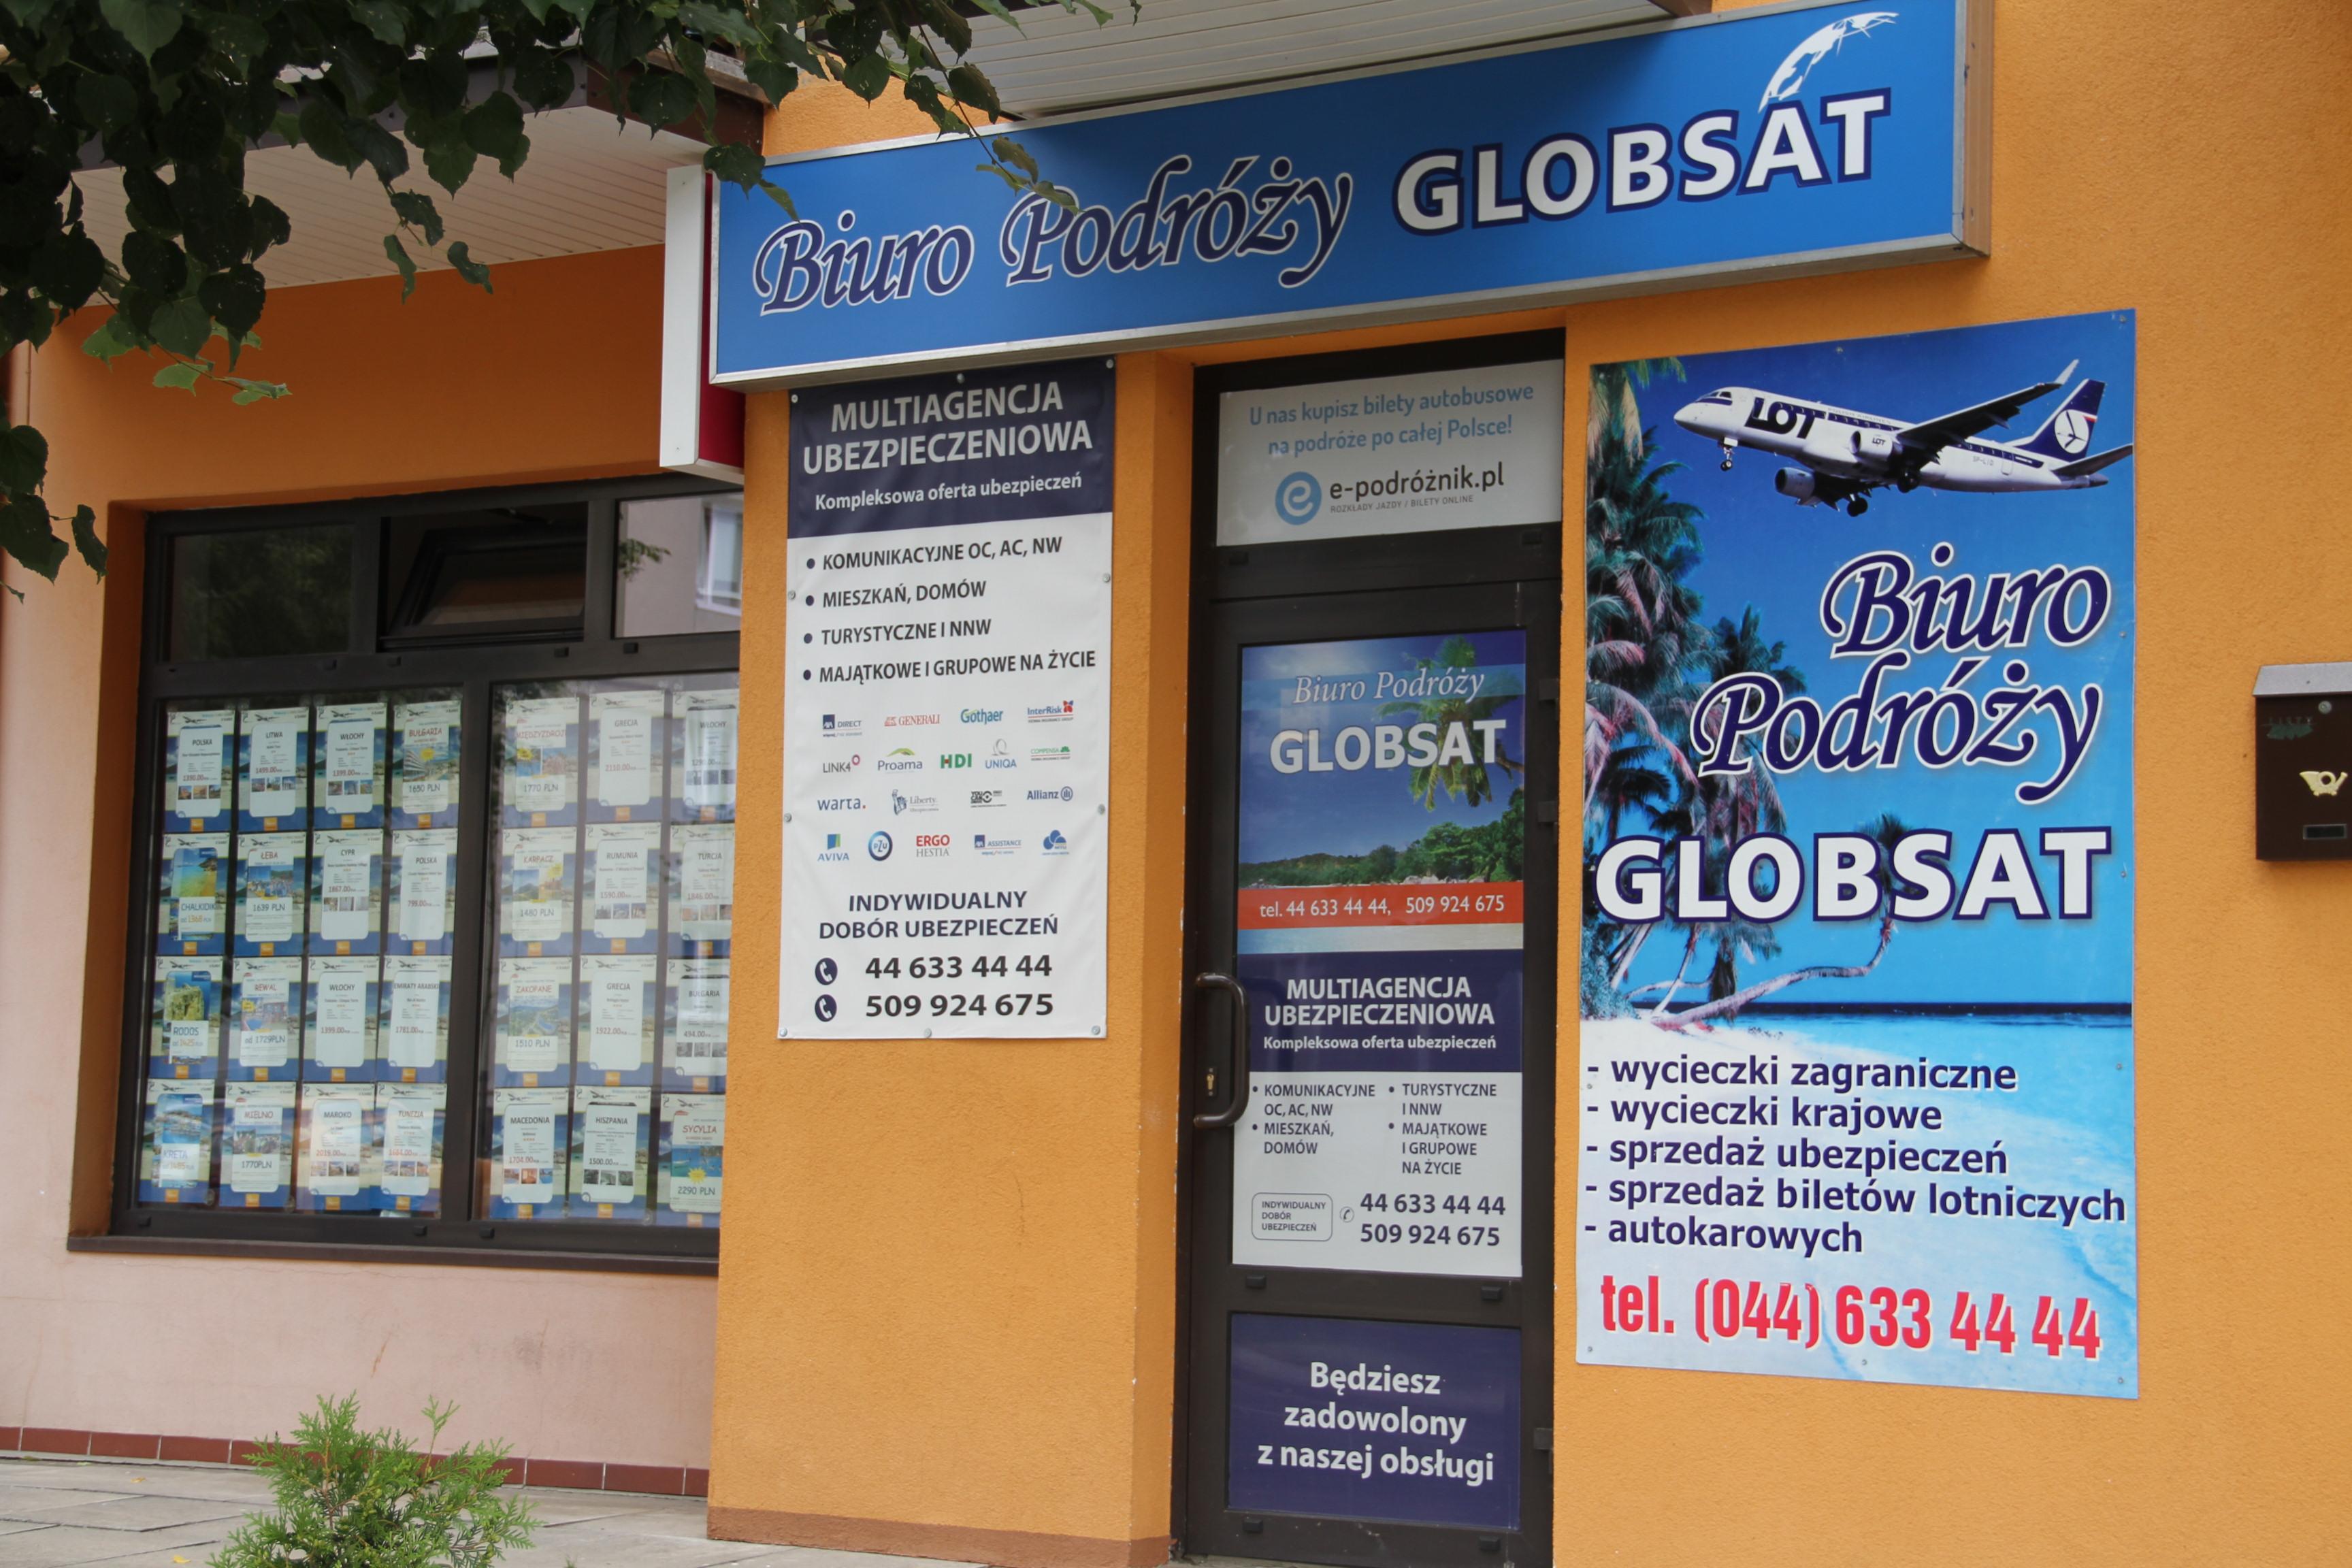 Biuro Podróży Globsat